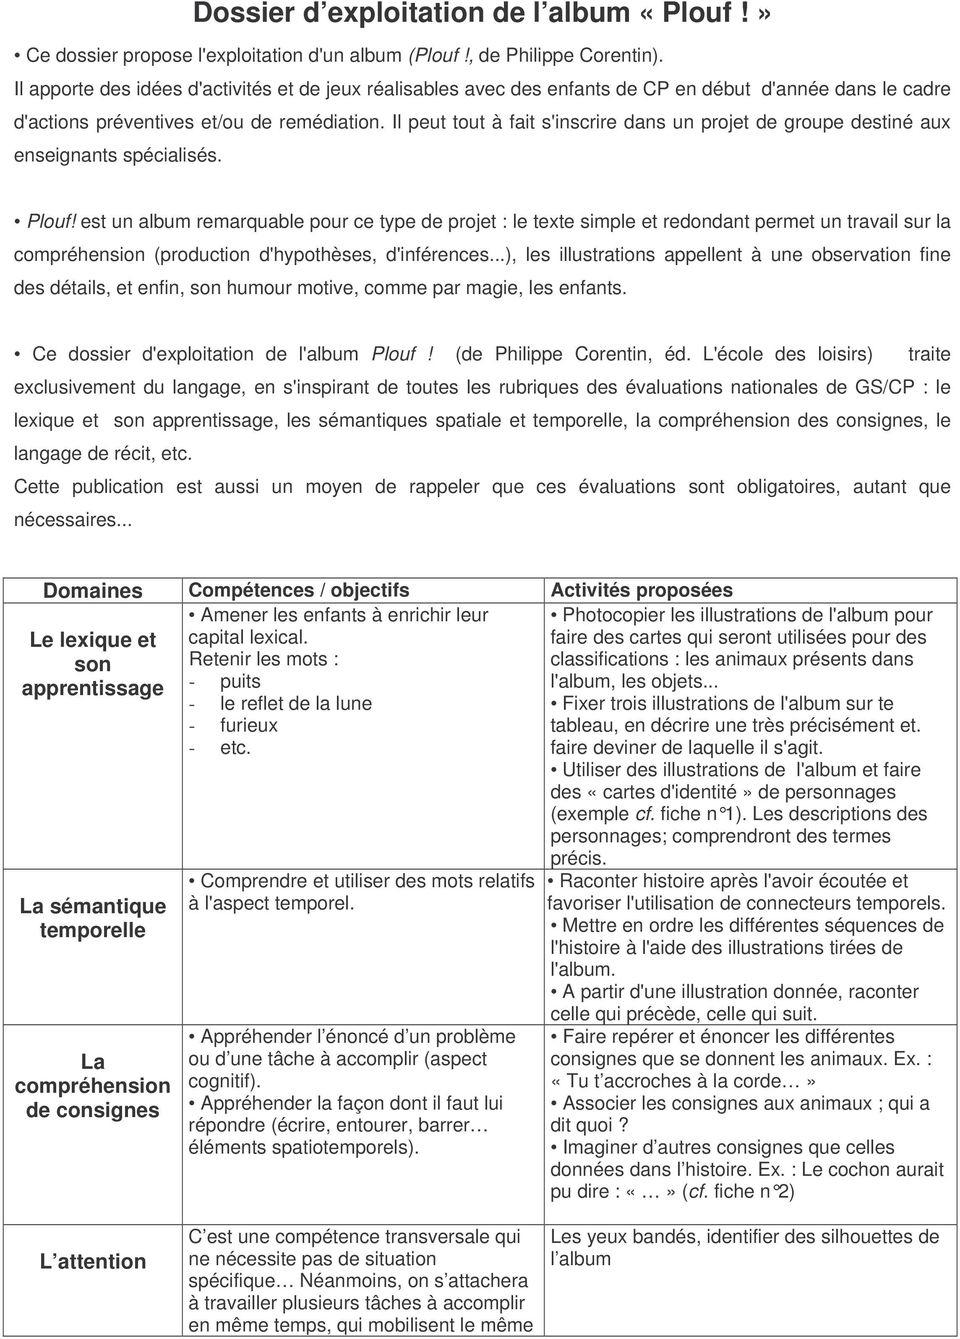 Dossier D Exploitation De L Album «Plouf!» - Pdf serapportantà Album Plouf